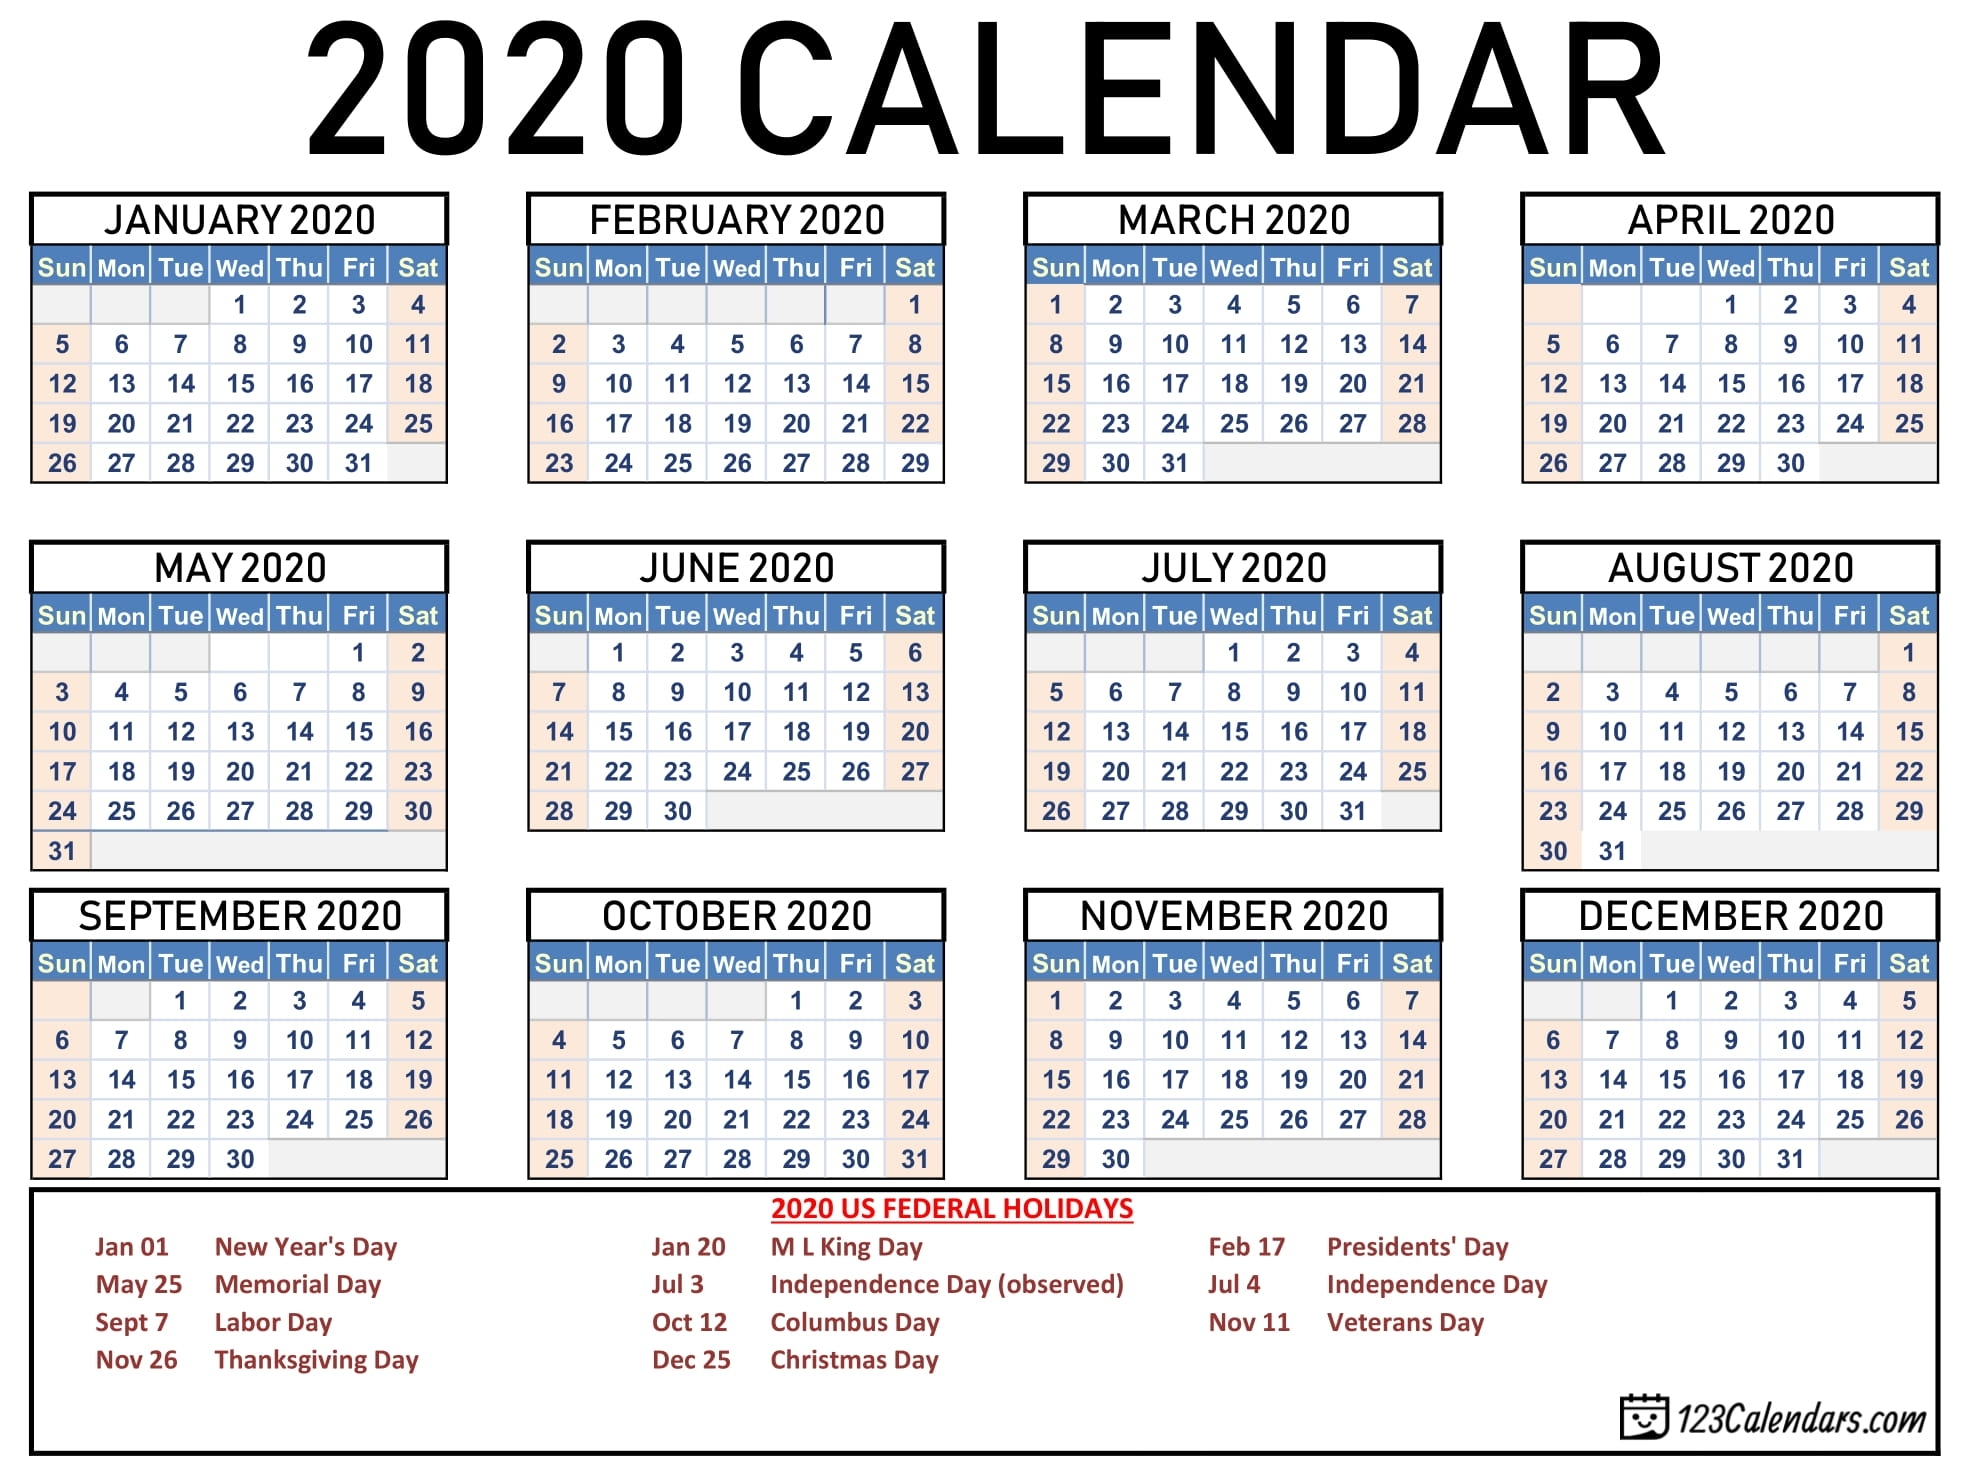 Free Printable 2020 Calendar   123Calendars